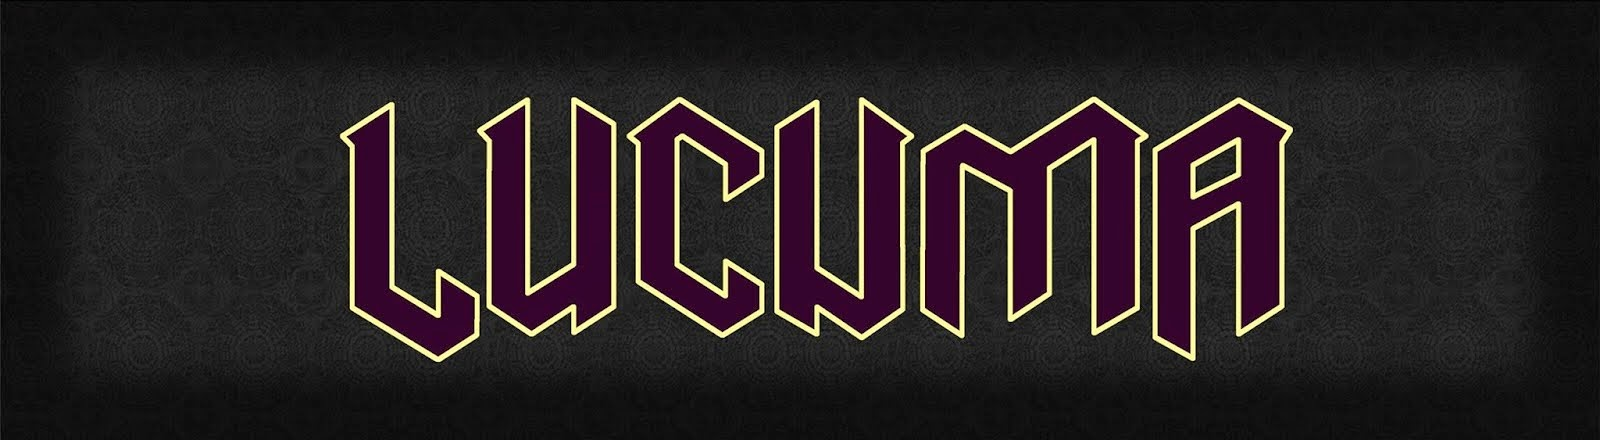 Lucuma - Destruye La Ciudad Psicologica - 2014